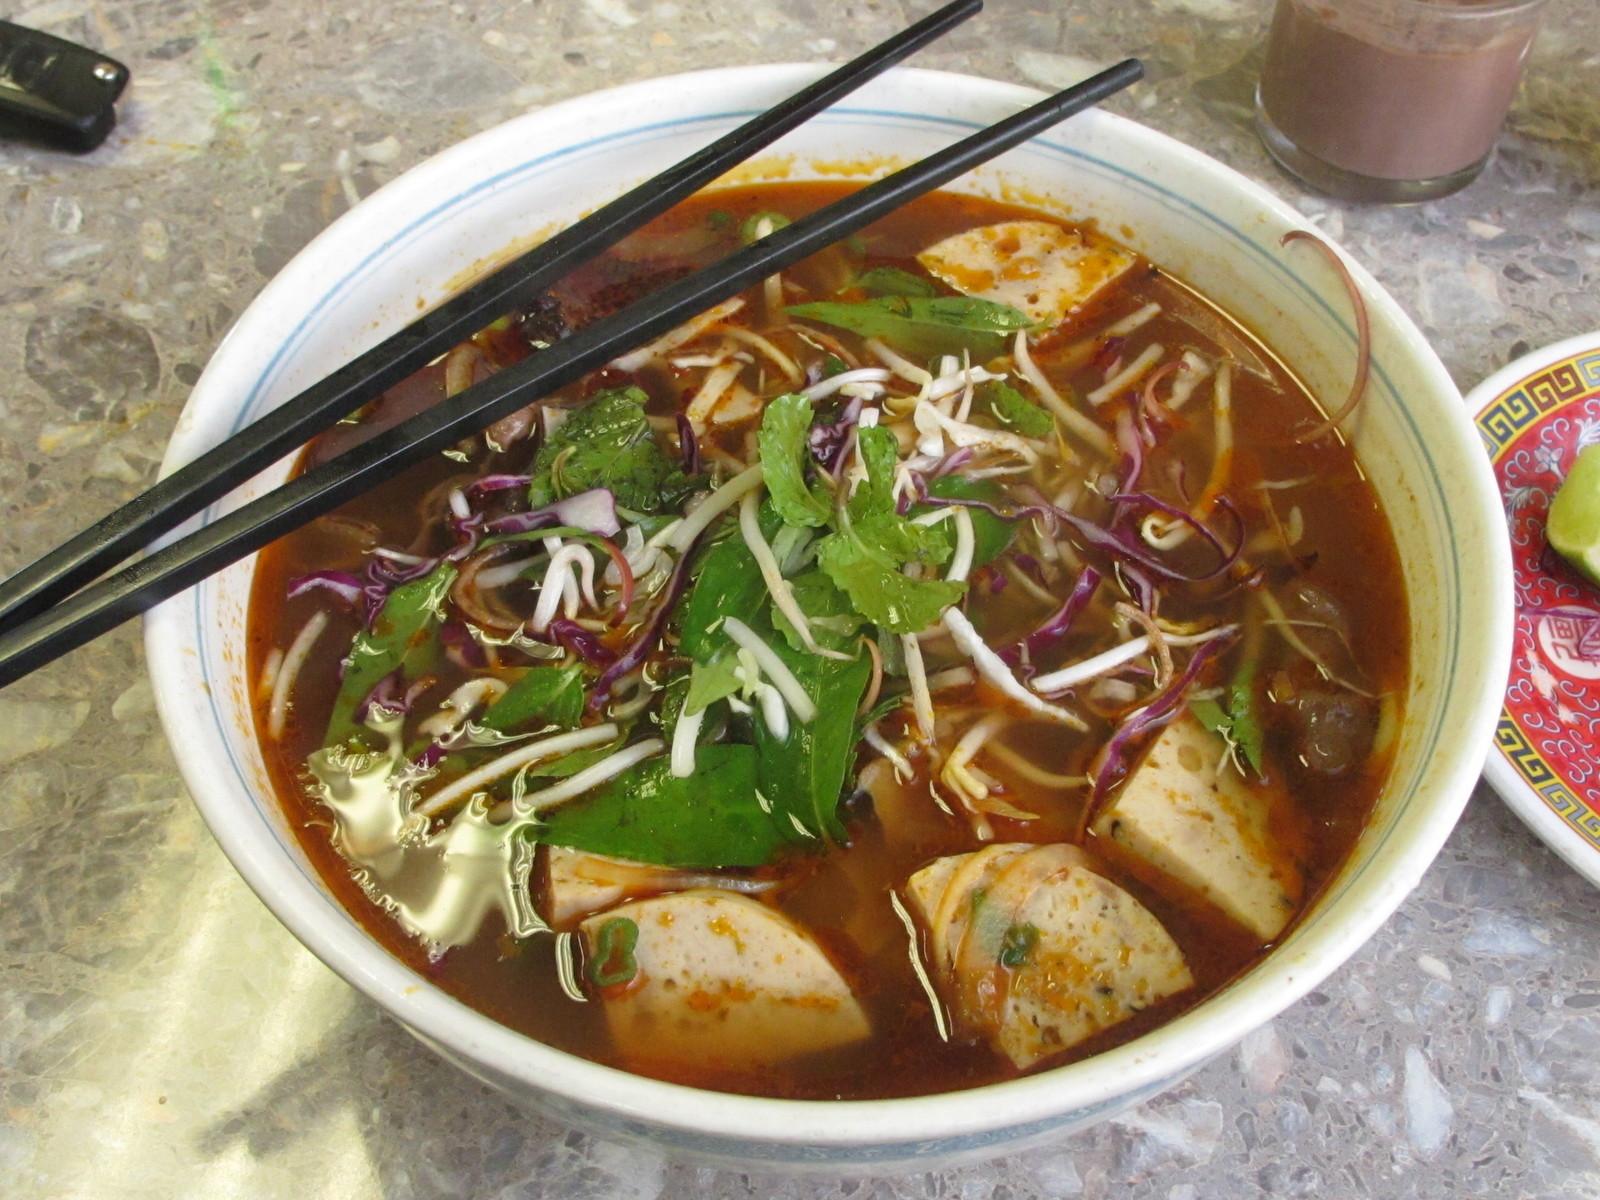 Image from Da Nang Foodie